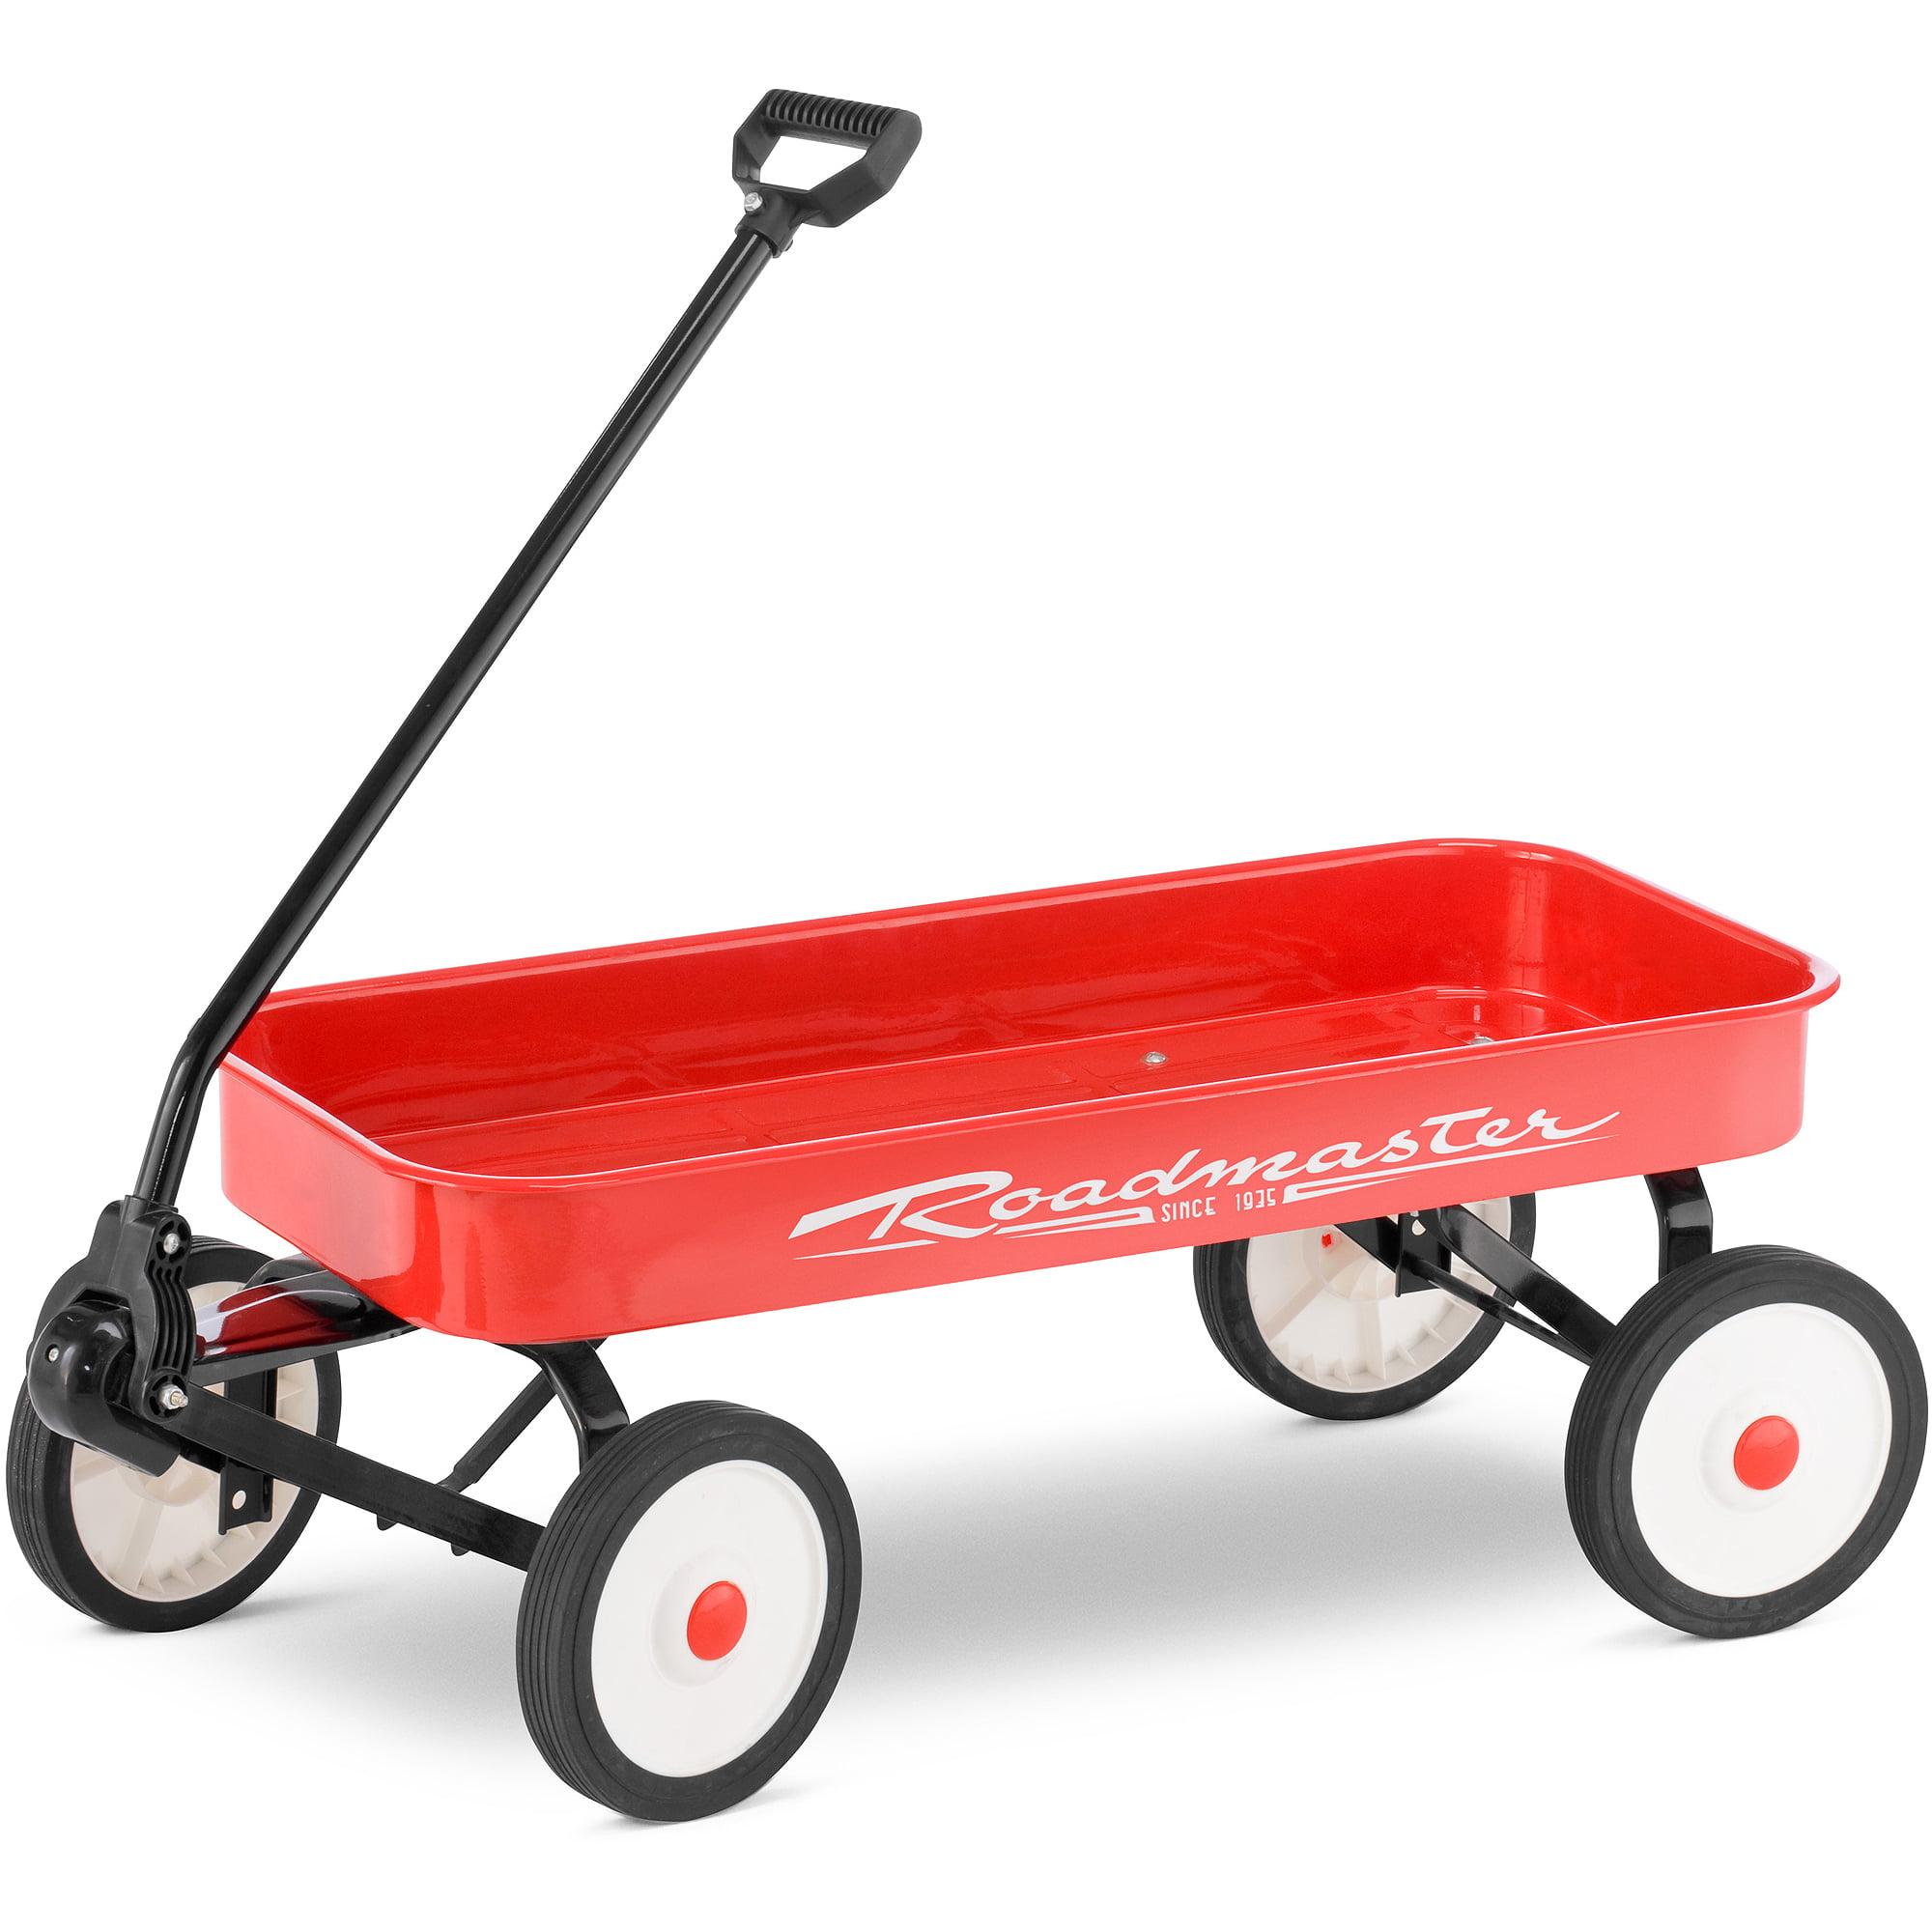 "Roadmaster 34"" Steel Wagon, Red"